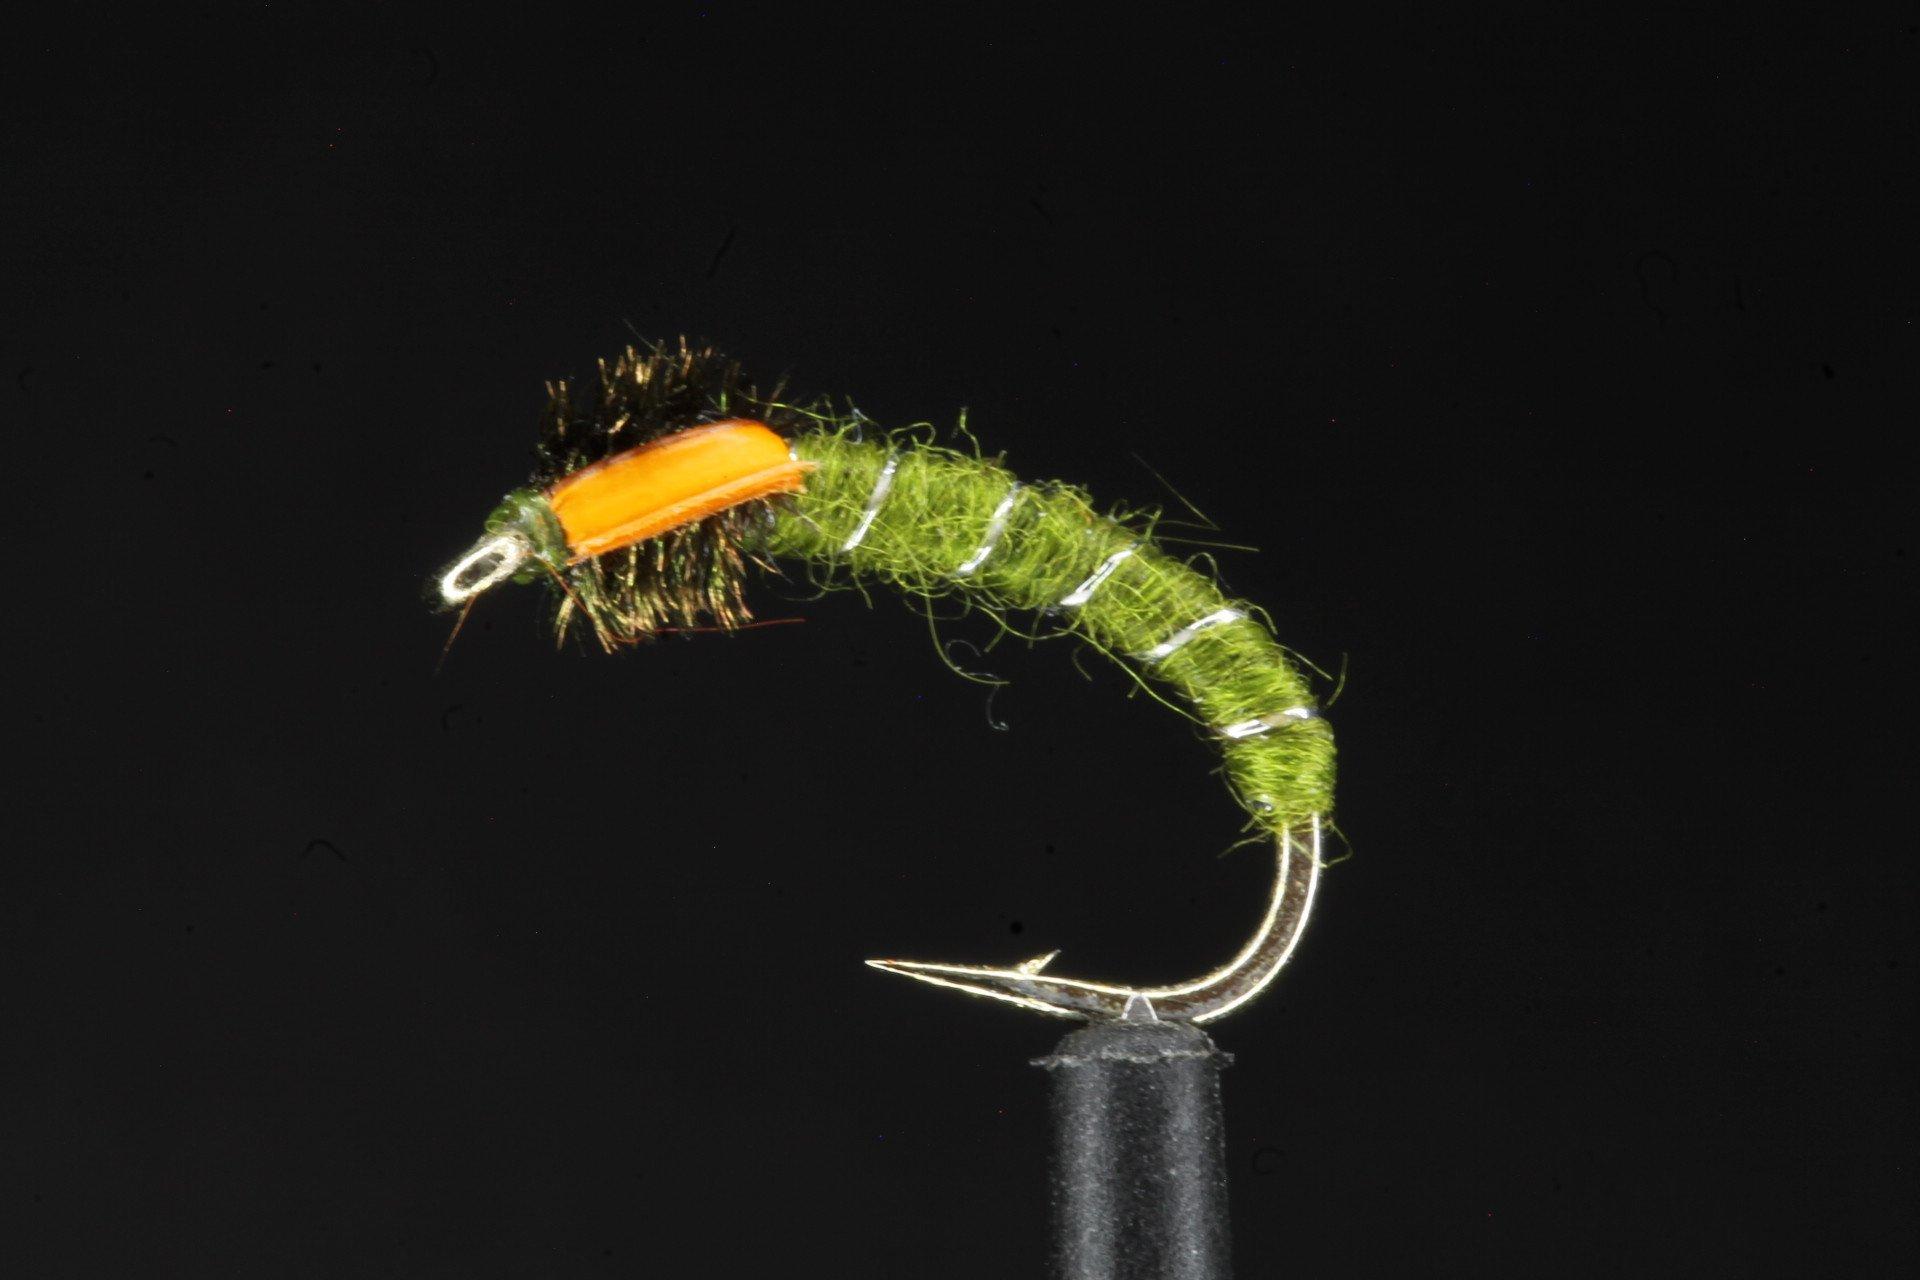 Blakestone Buzzer Fly - Olive Body